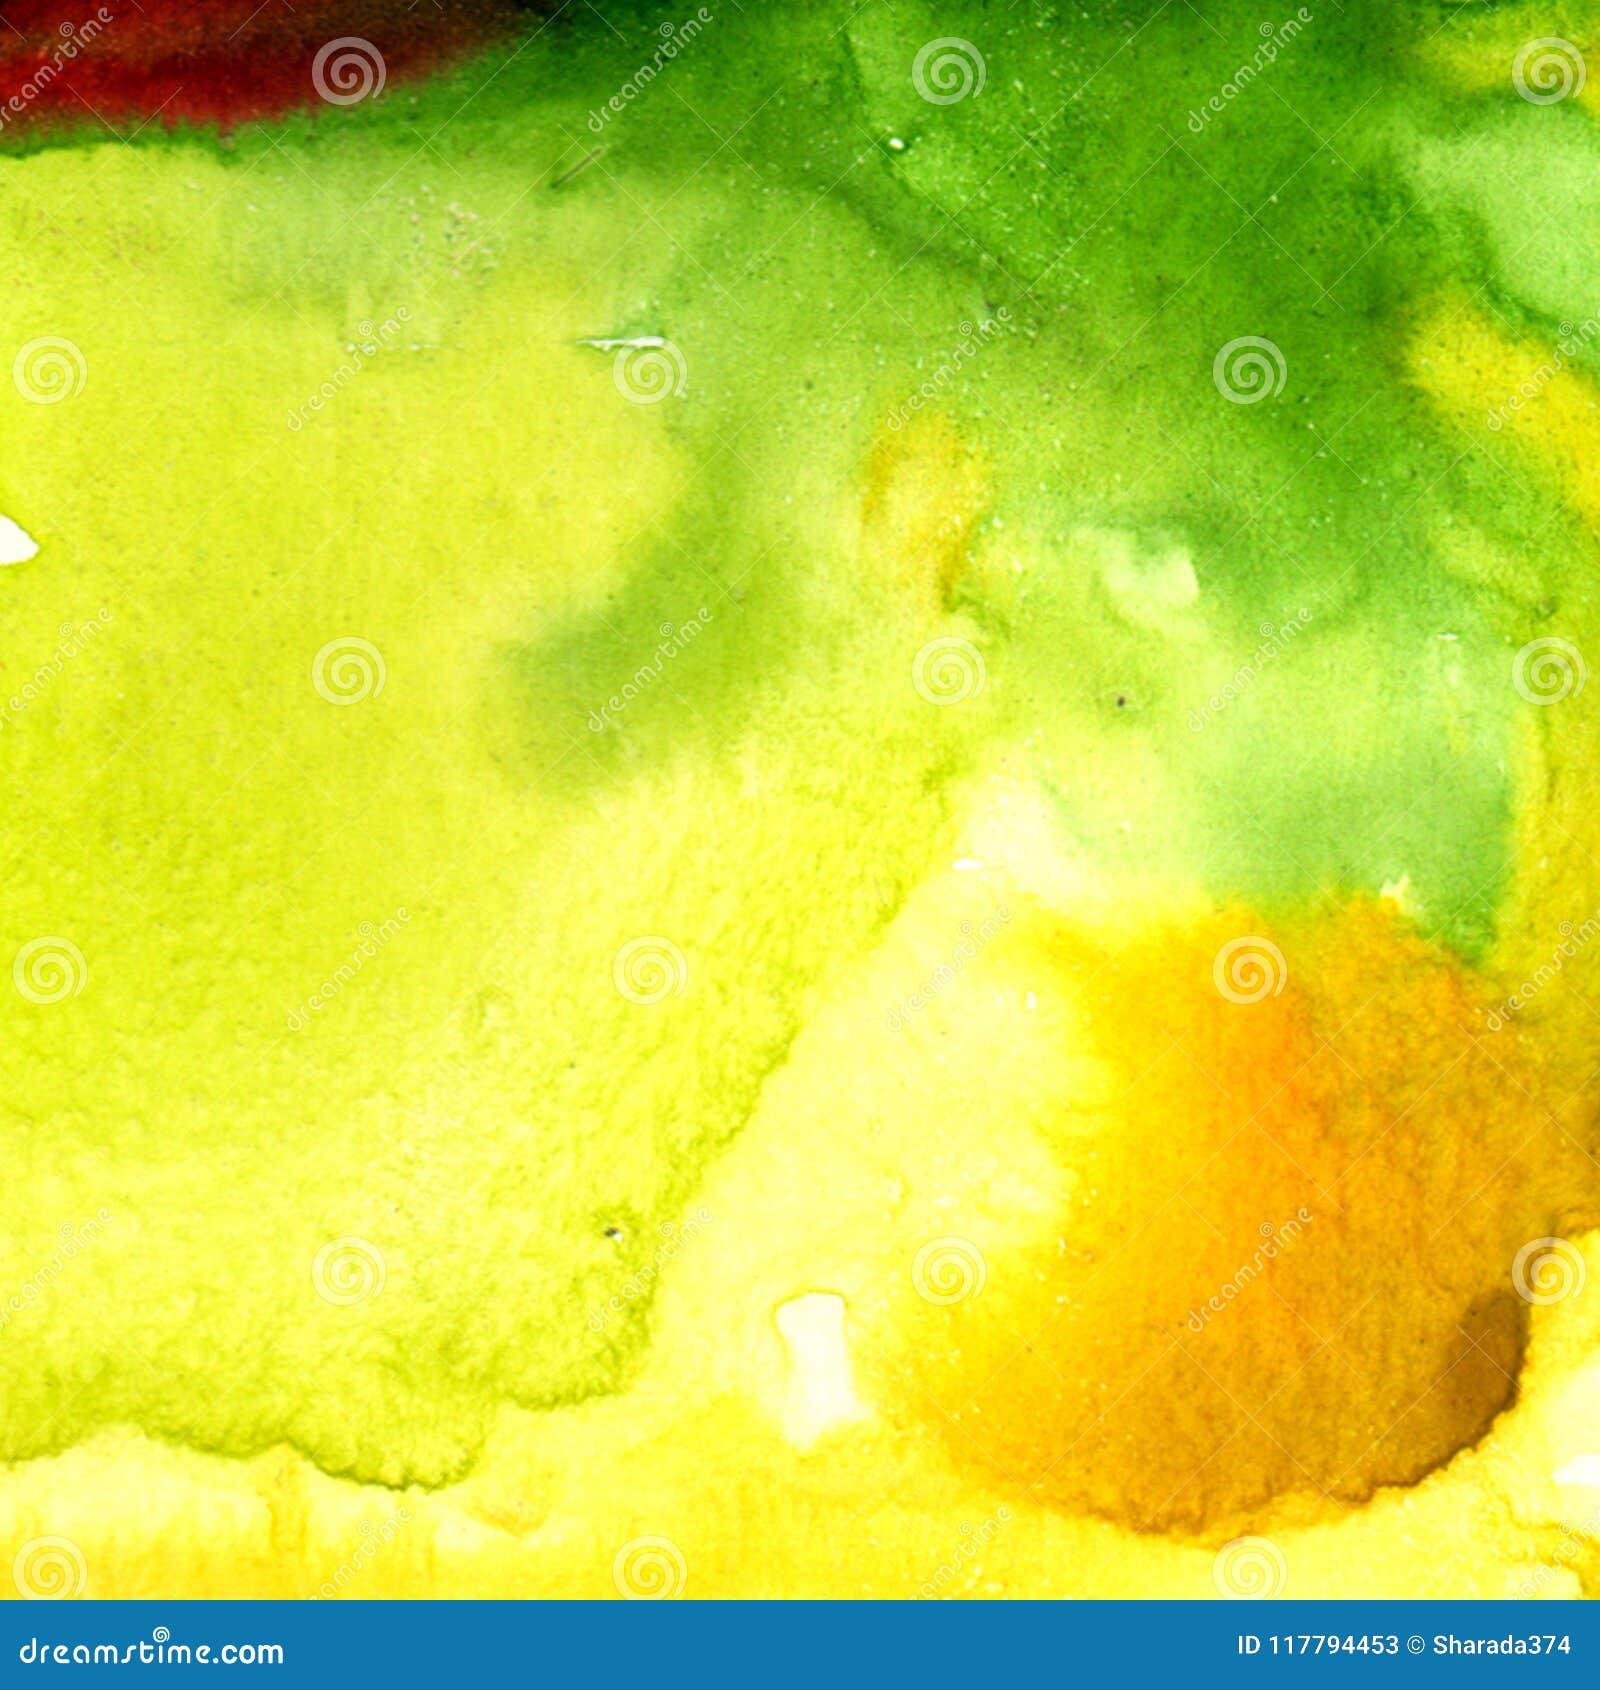 Watercolour splash background